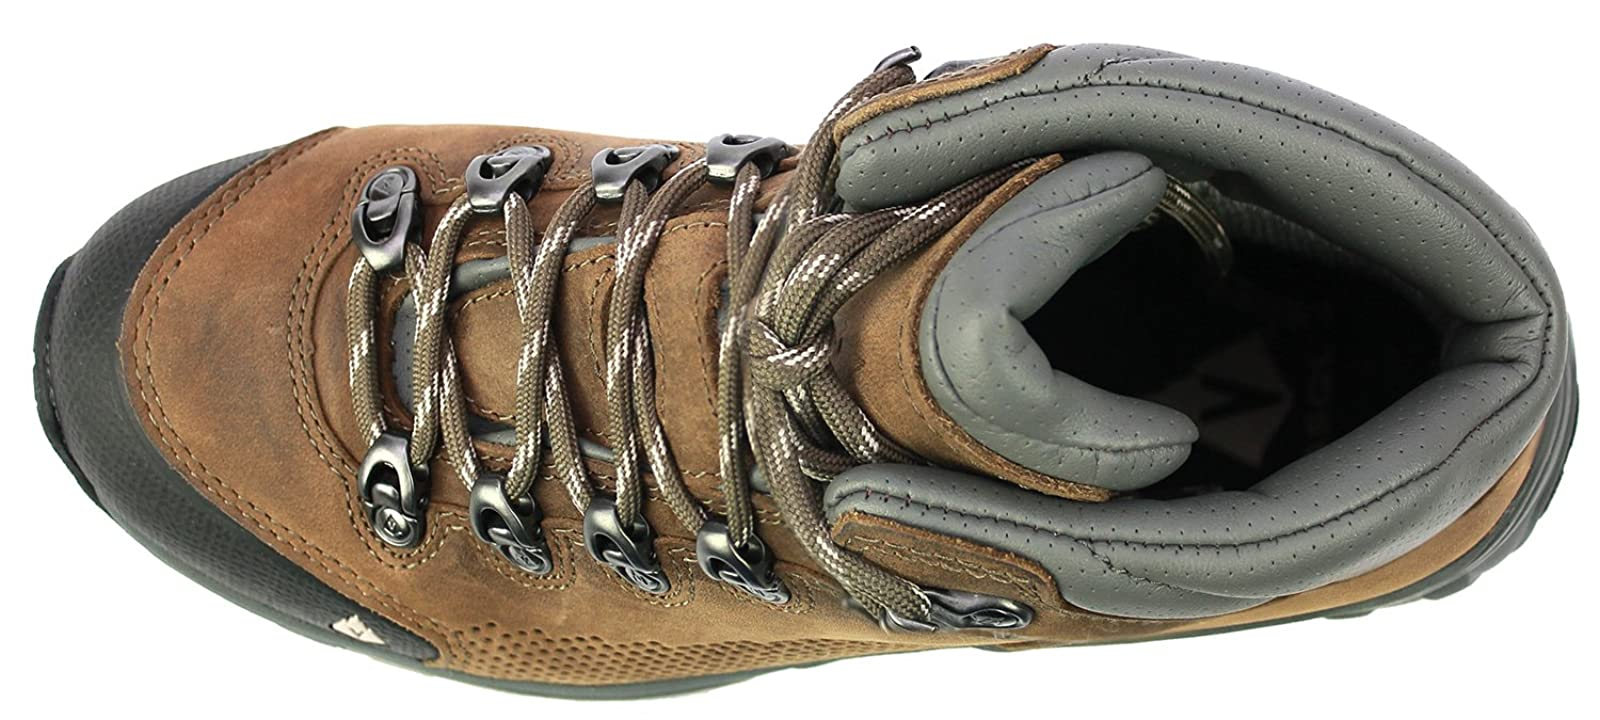 Vasque Women's St. Elias Gore-Tex Hiking Boot 8 M US Women - 10